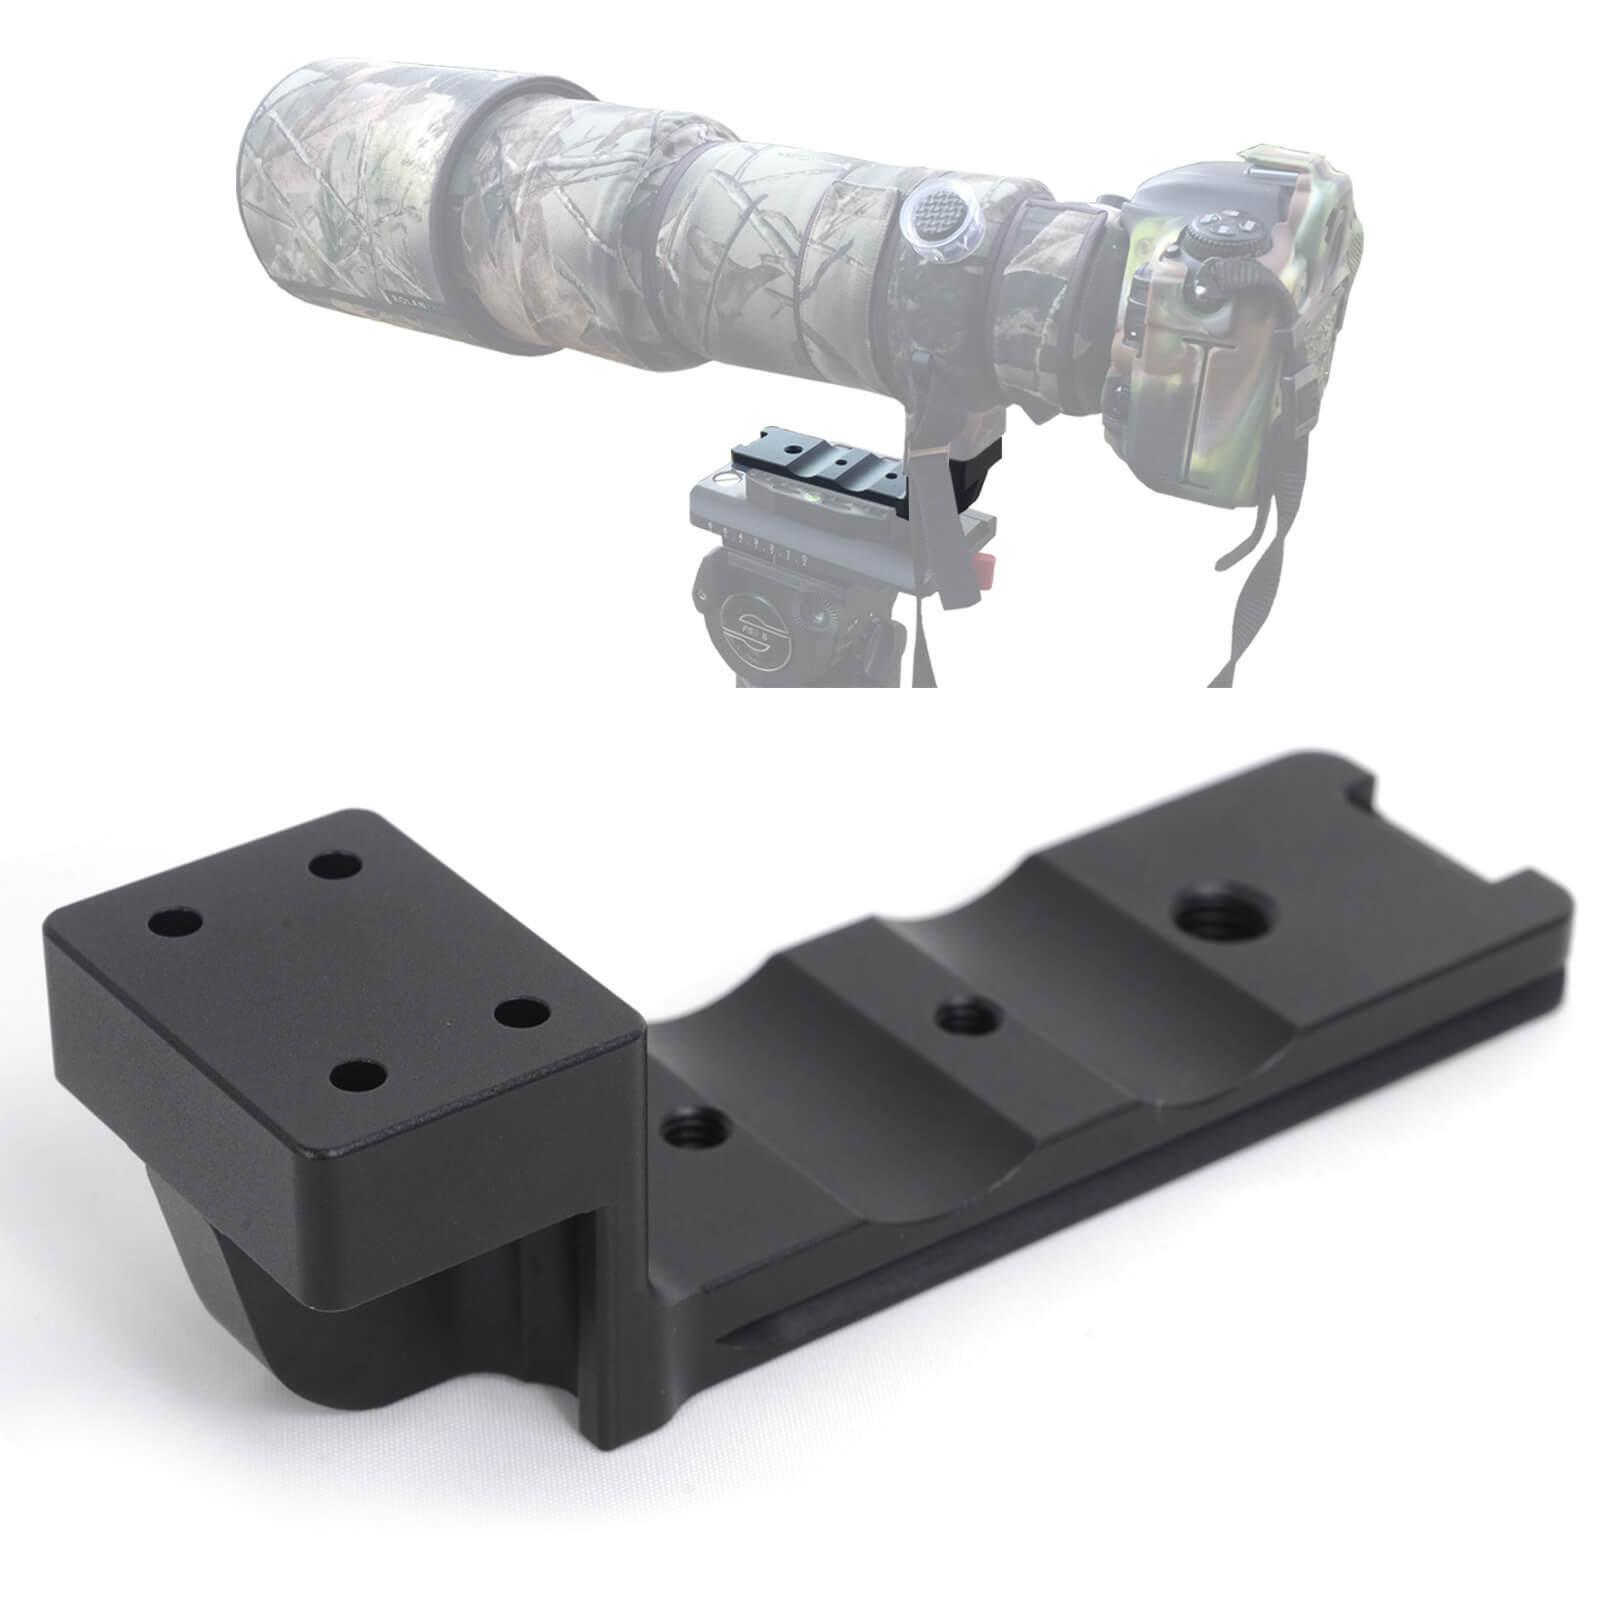 Lens Tripod Mount Collar Ring Base for Sigma 150-600mm f/5-6.3 DG OS HSM Sports